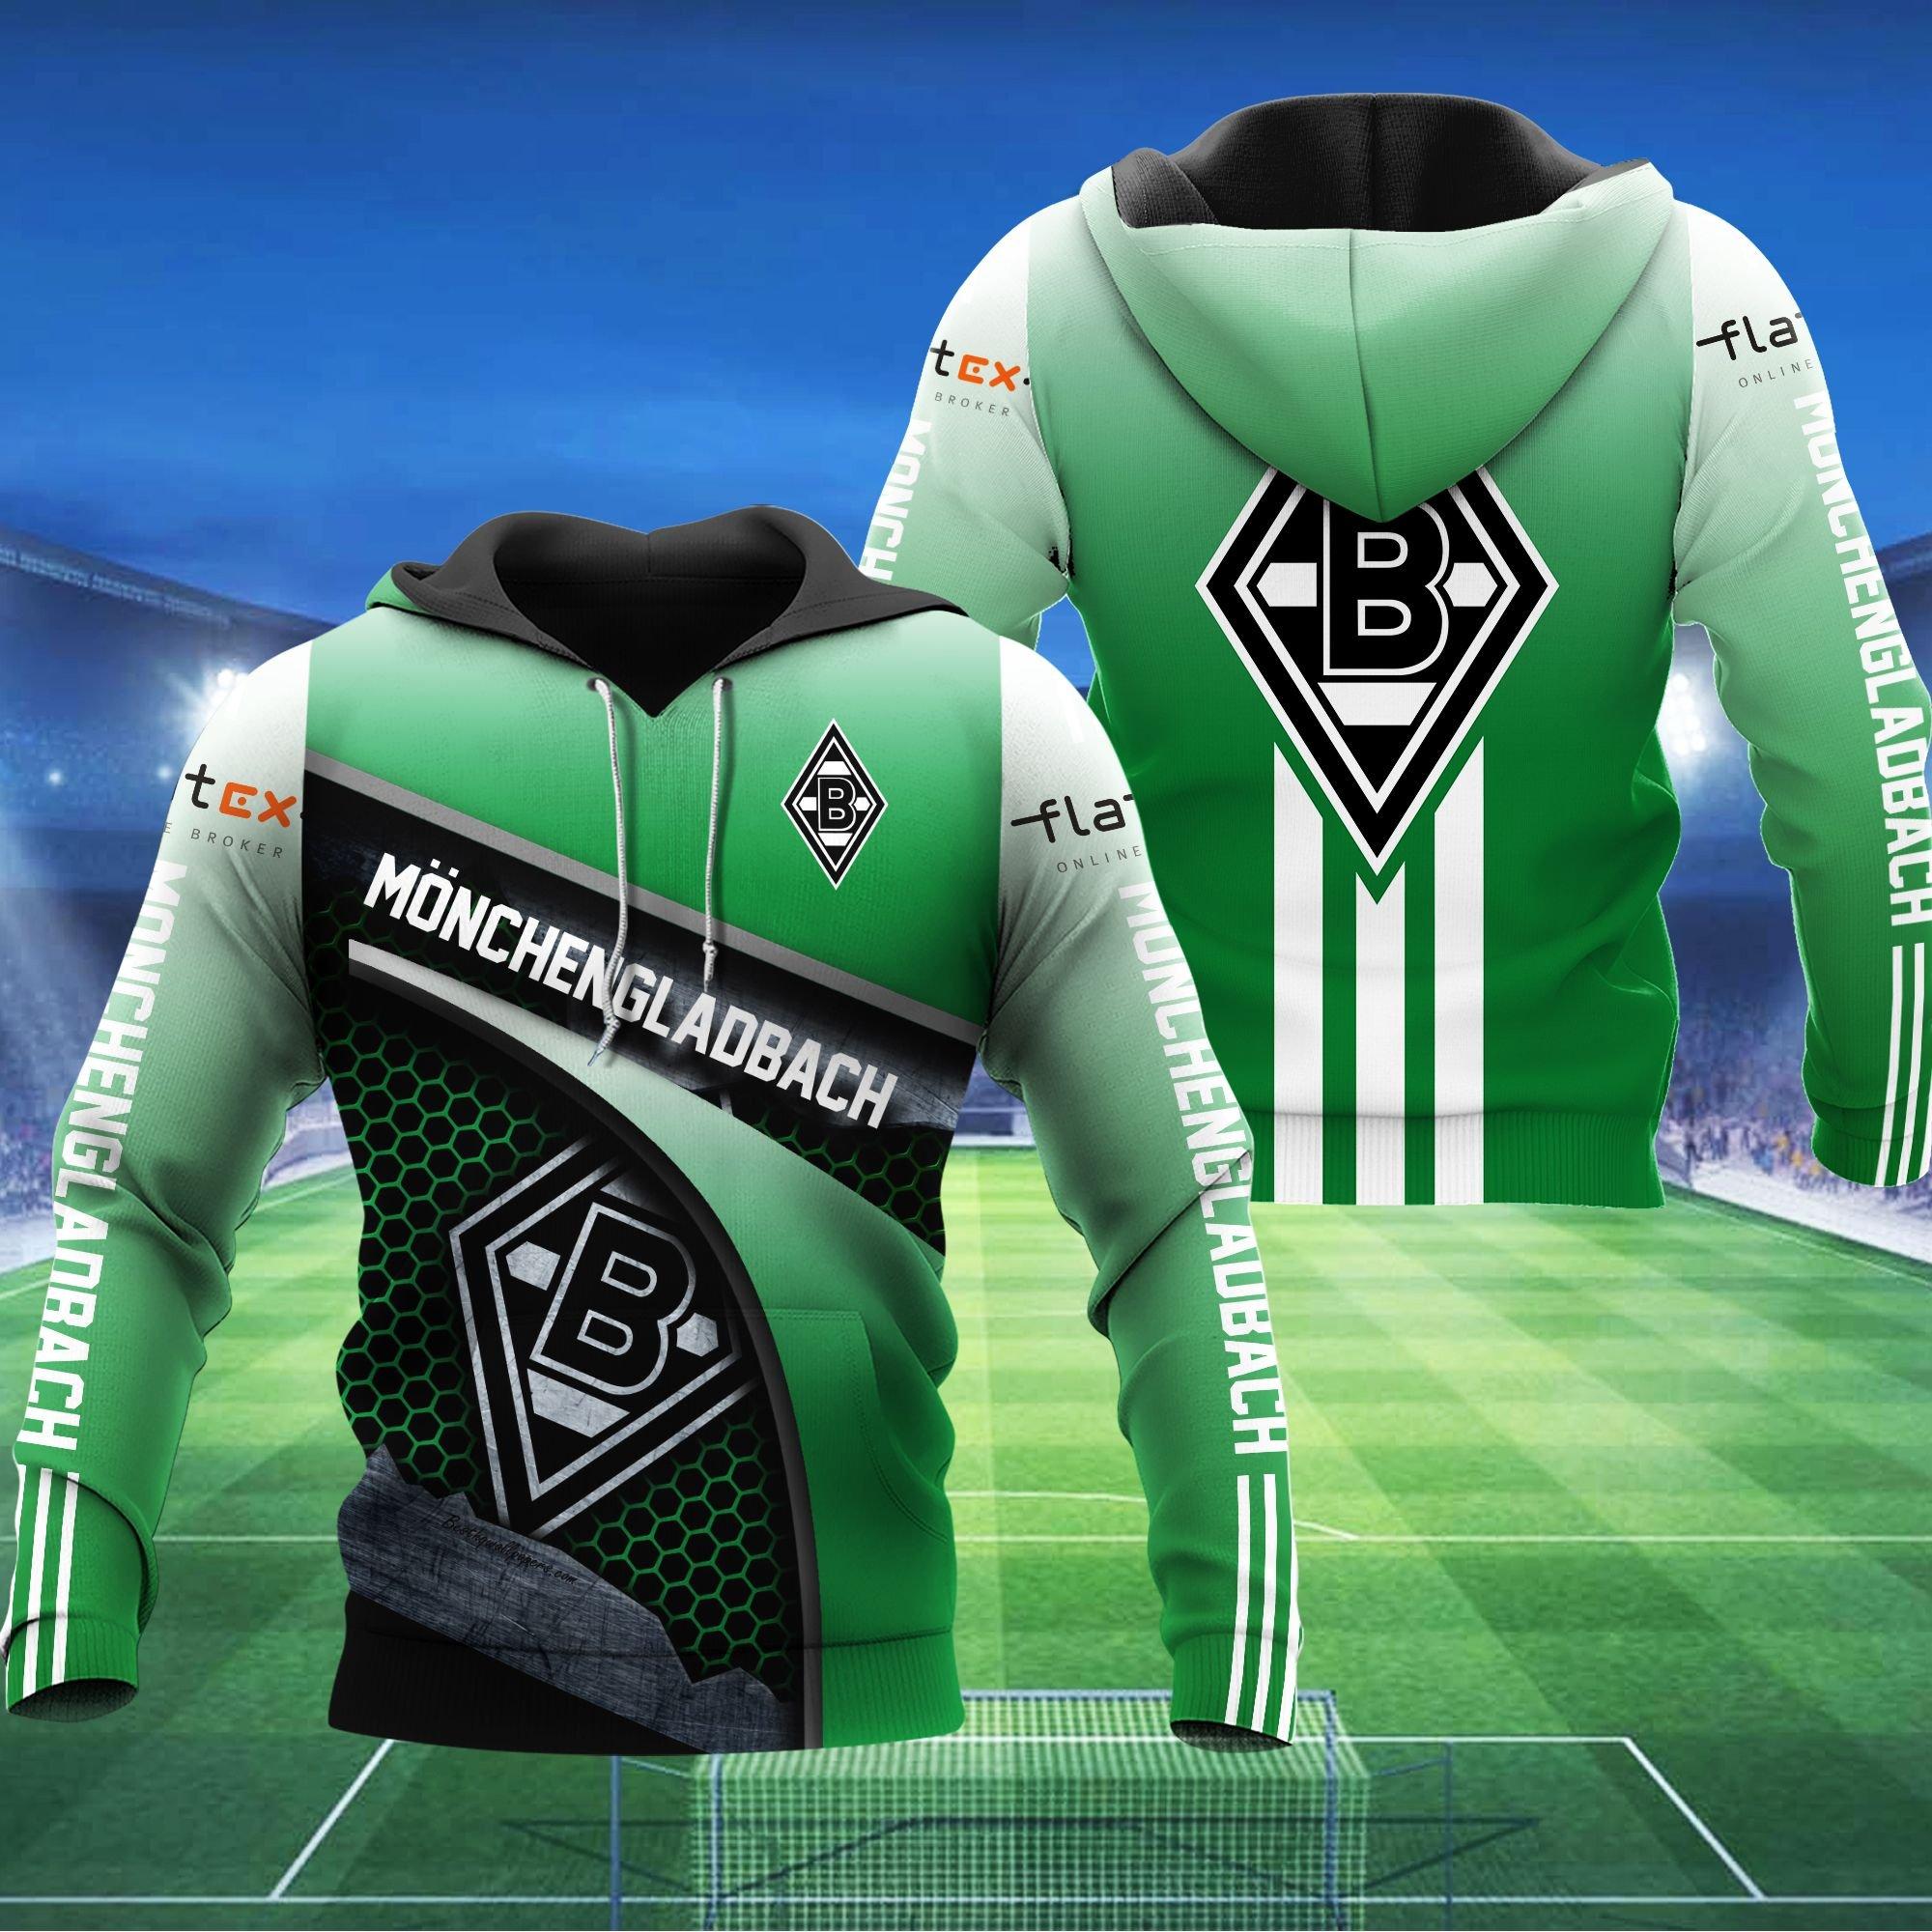 Monchengl Adbach BoM 3D hoodie